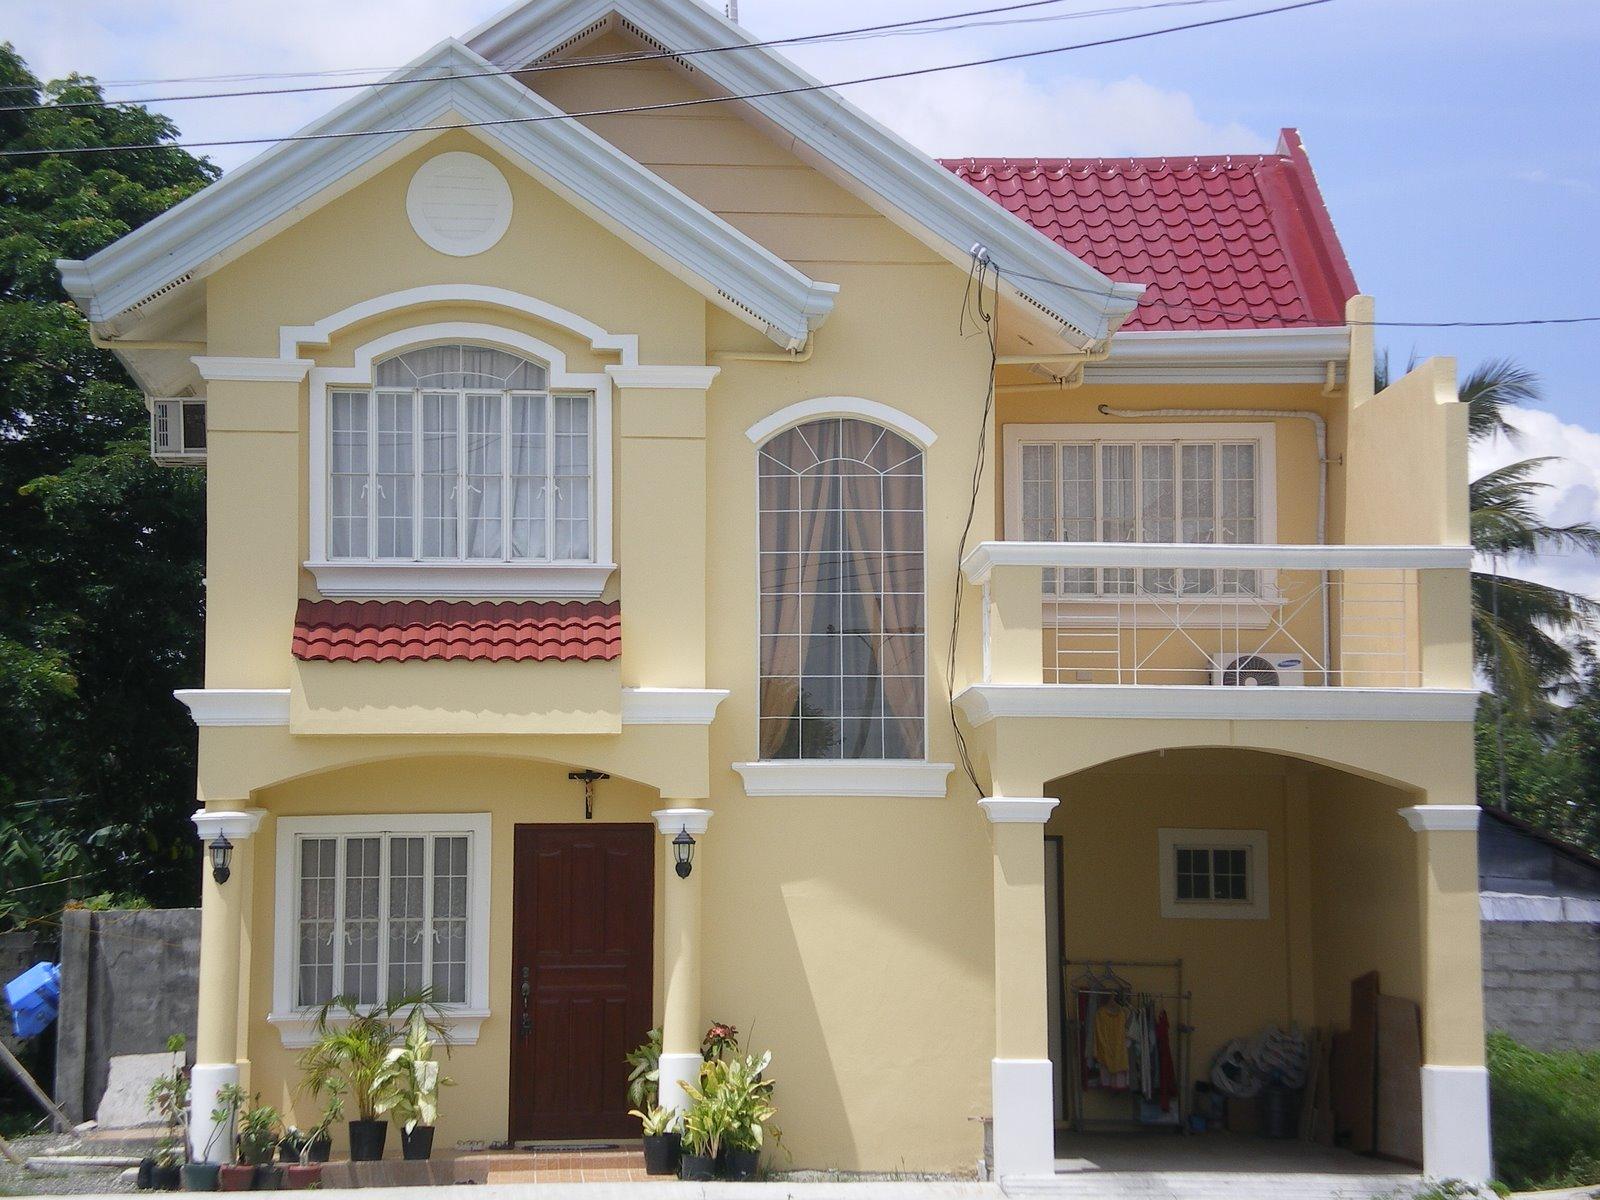 Centennial Villas Iloilo by Eon Realty and Development Corp